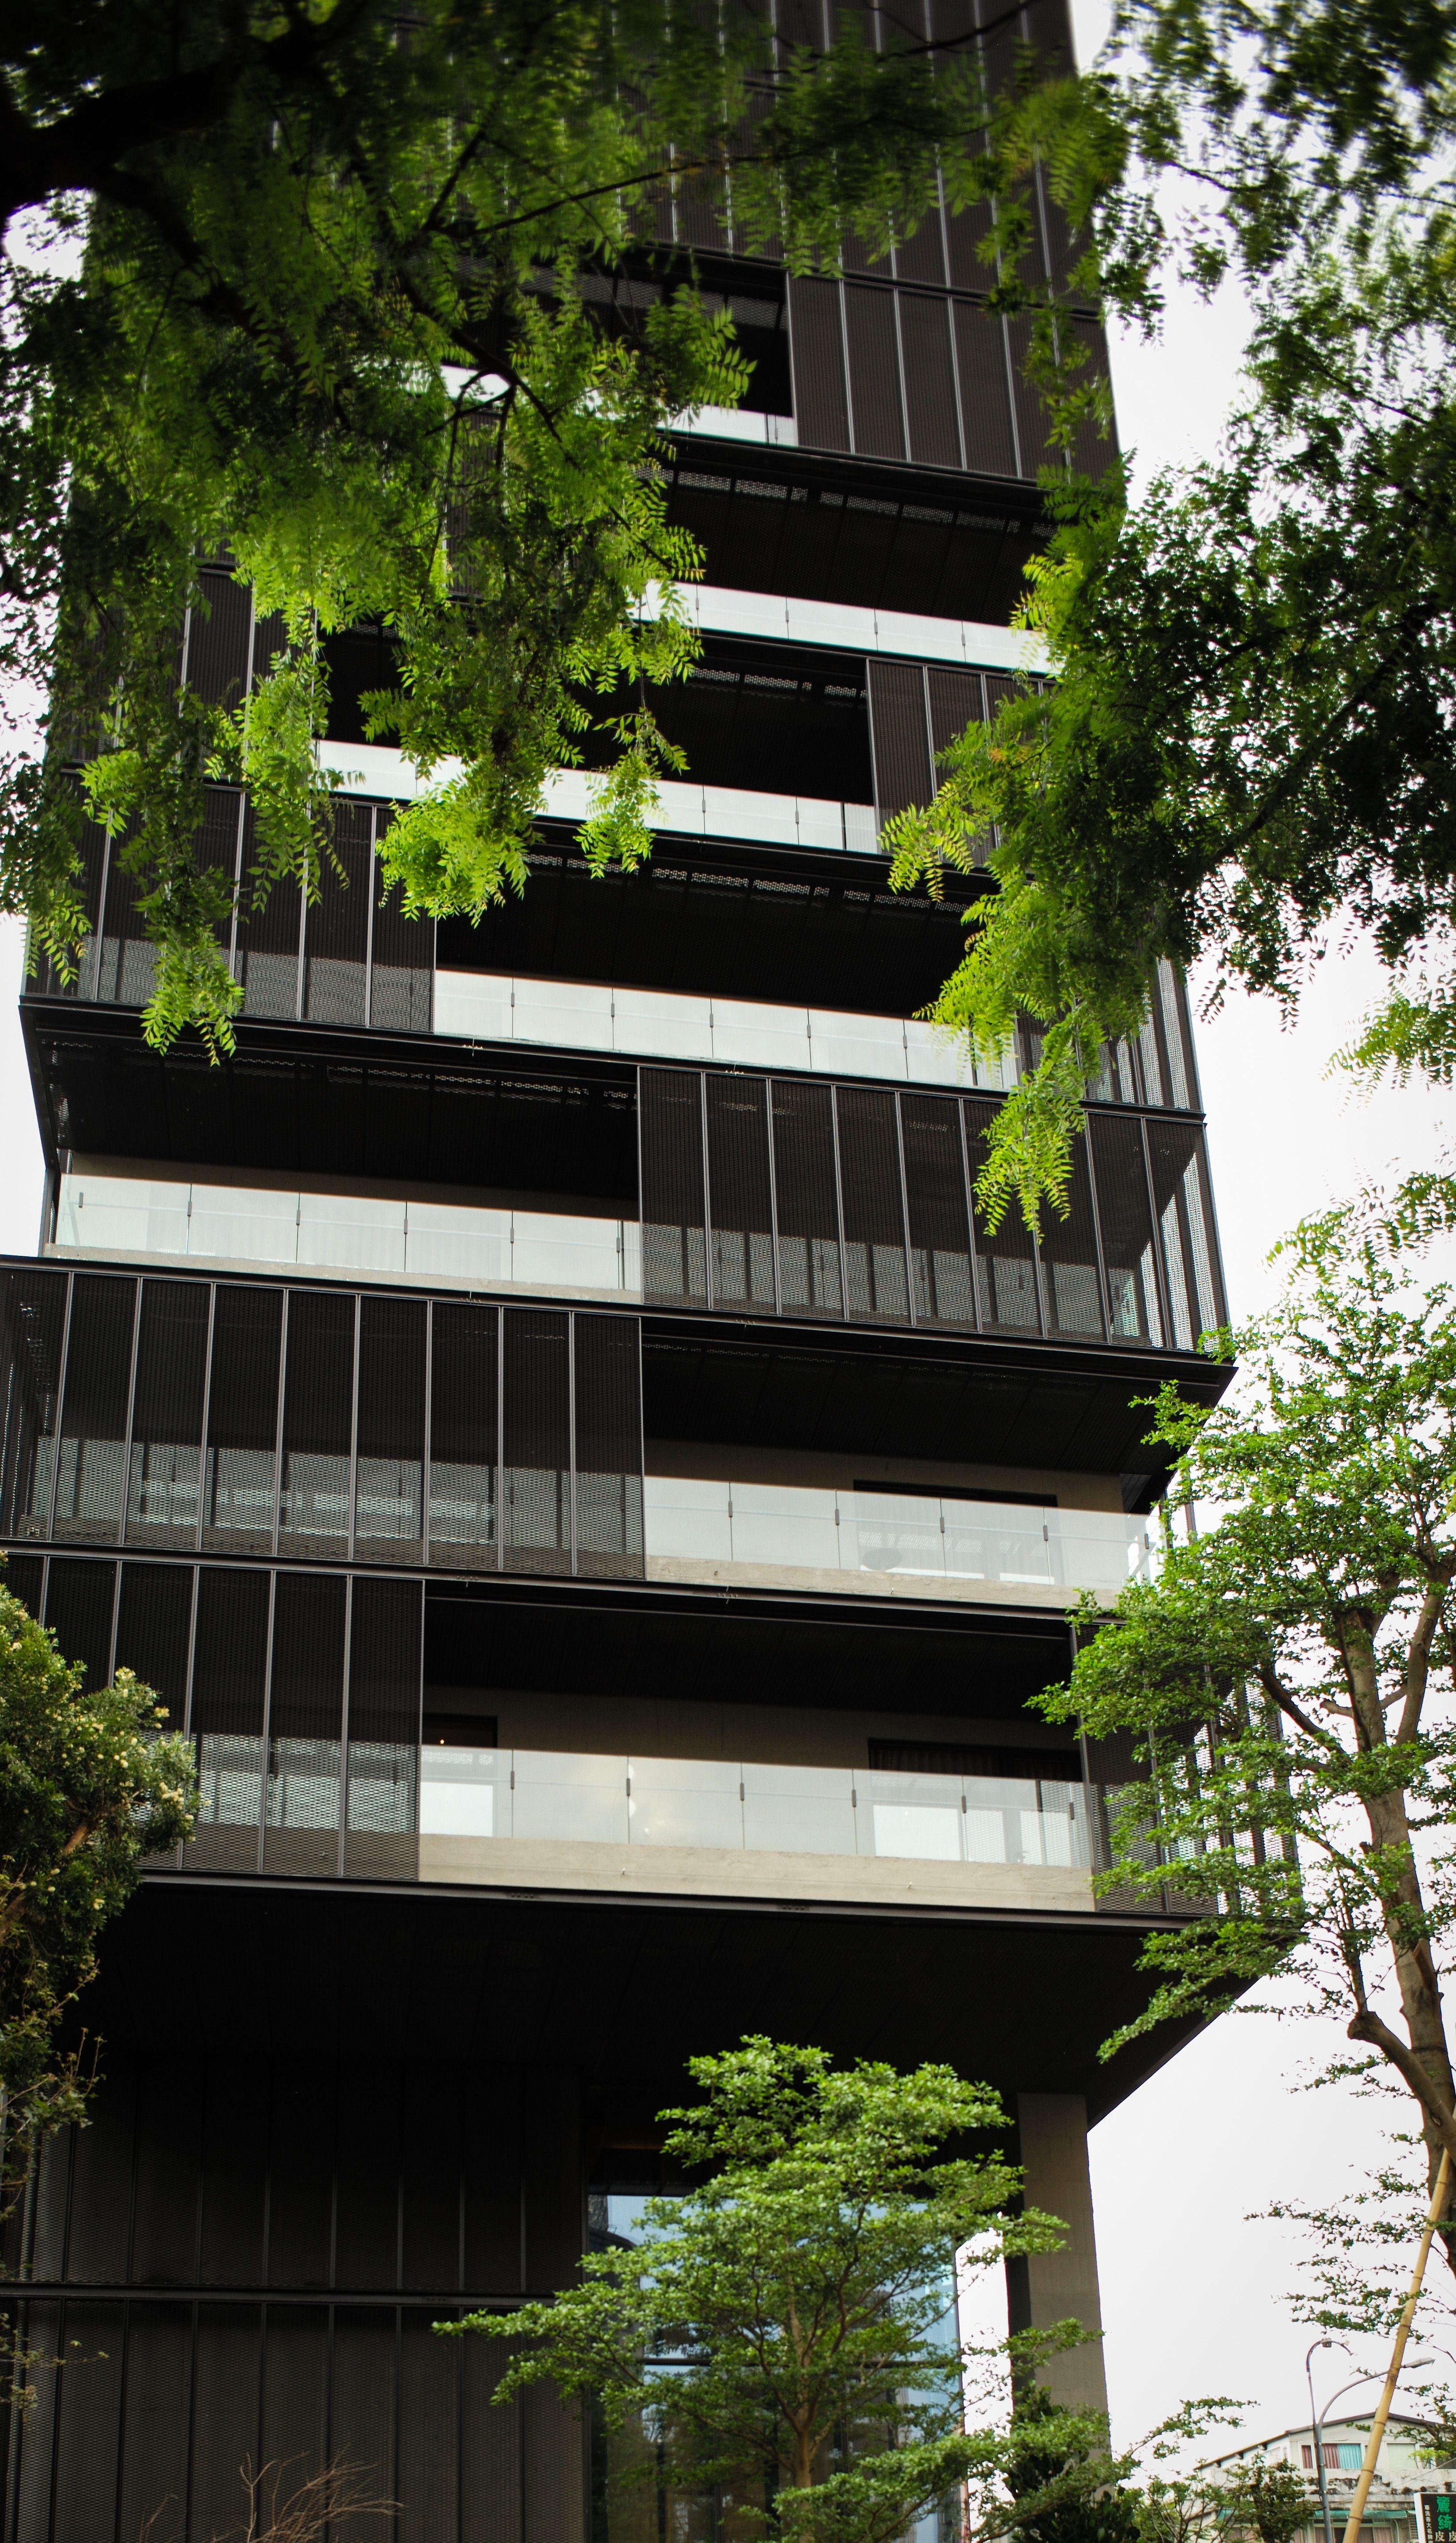 Hotel proverbs taipei architecture 10 pinterest for Design hotel taipei